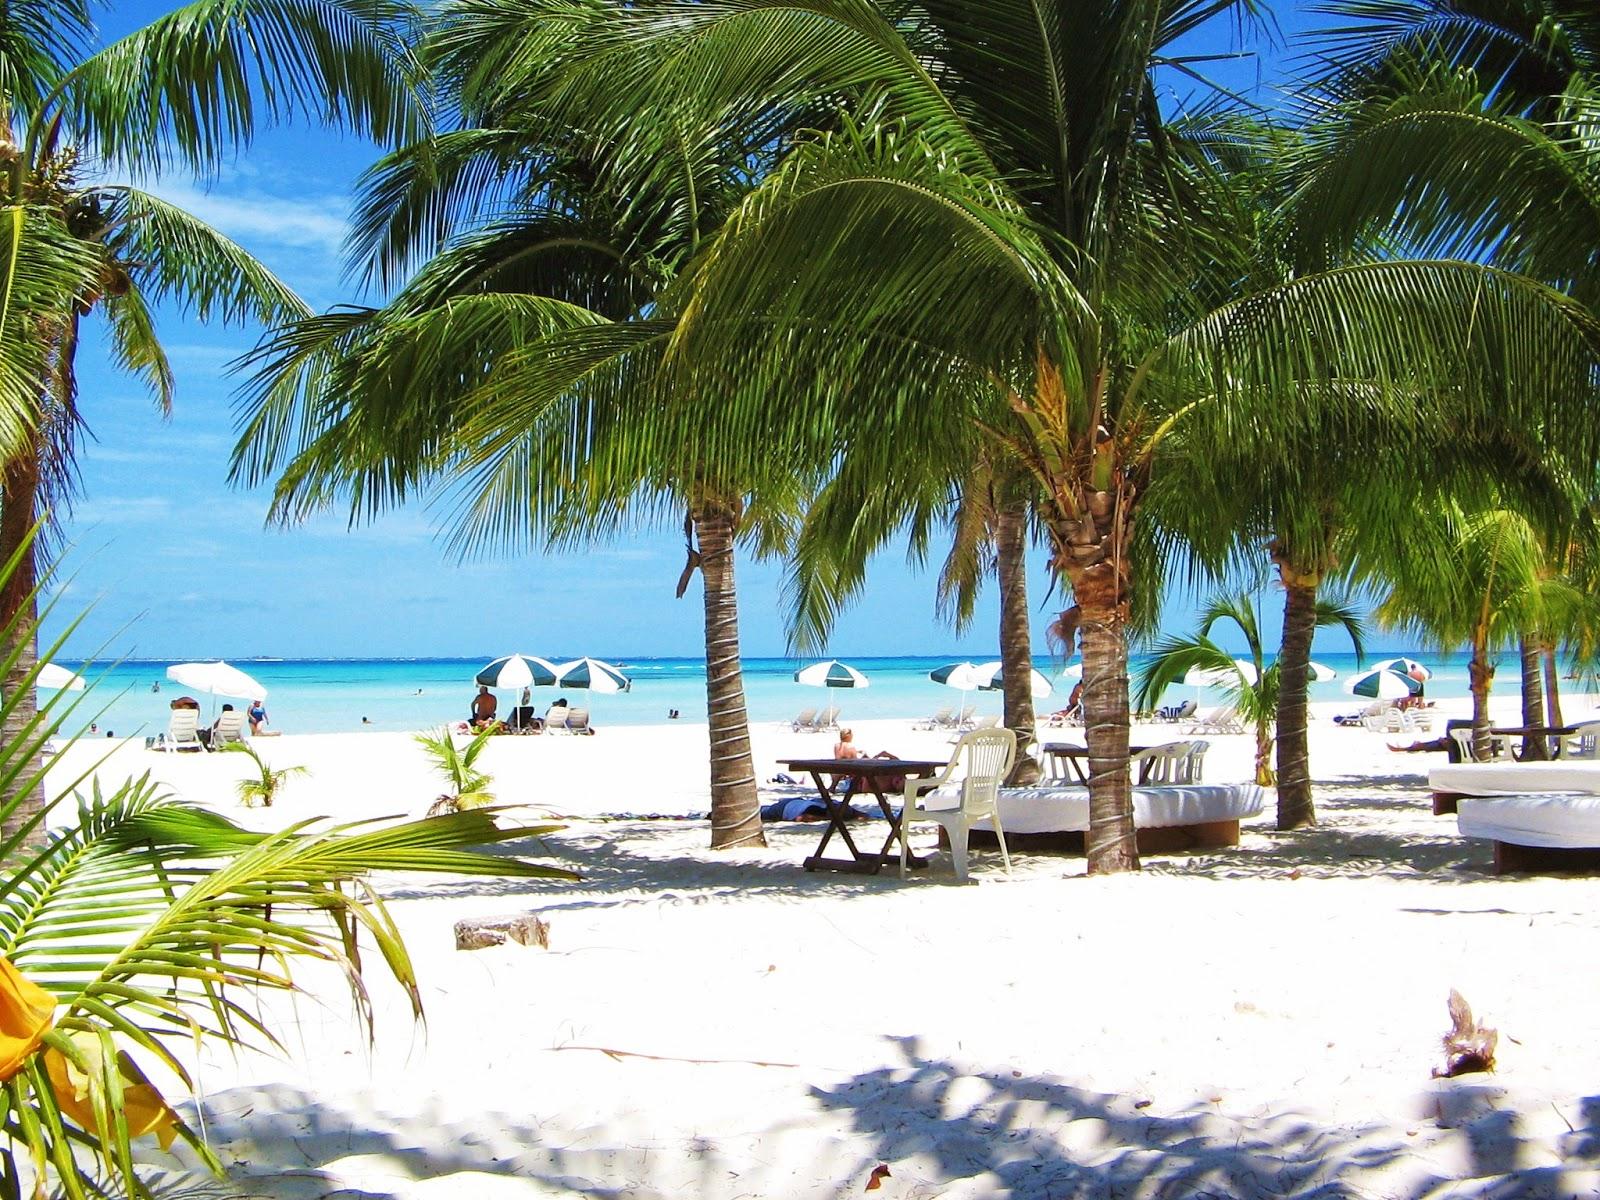 Playa Norte Beach Club